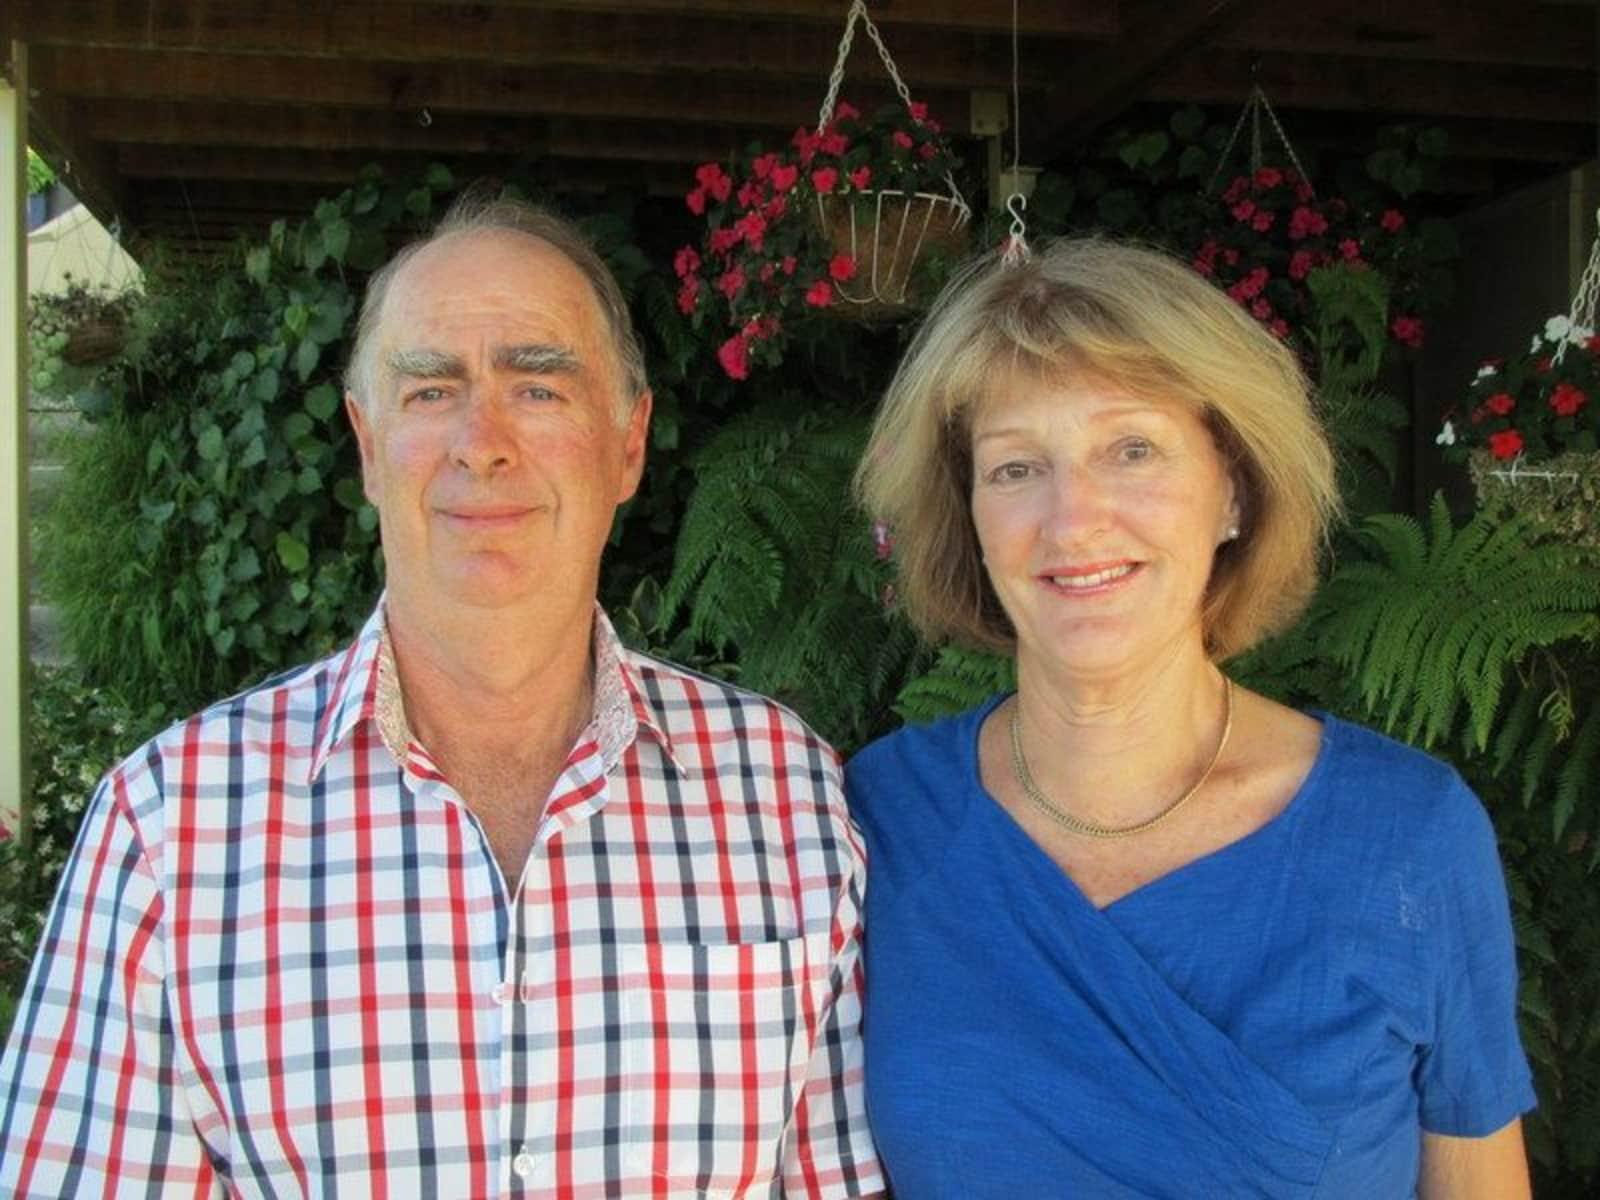 John & Marilyn from Nelson, New Zealand